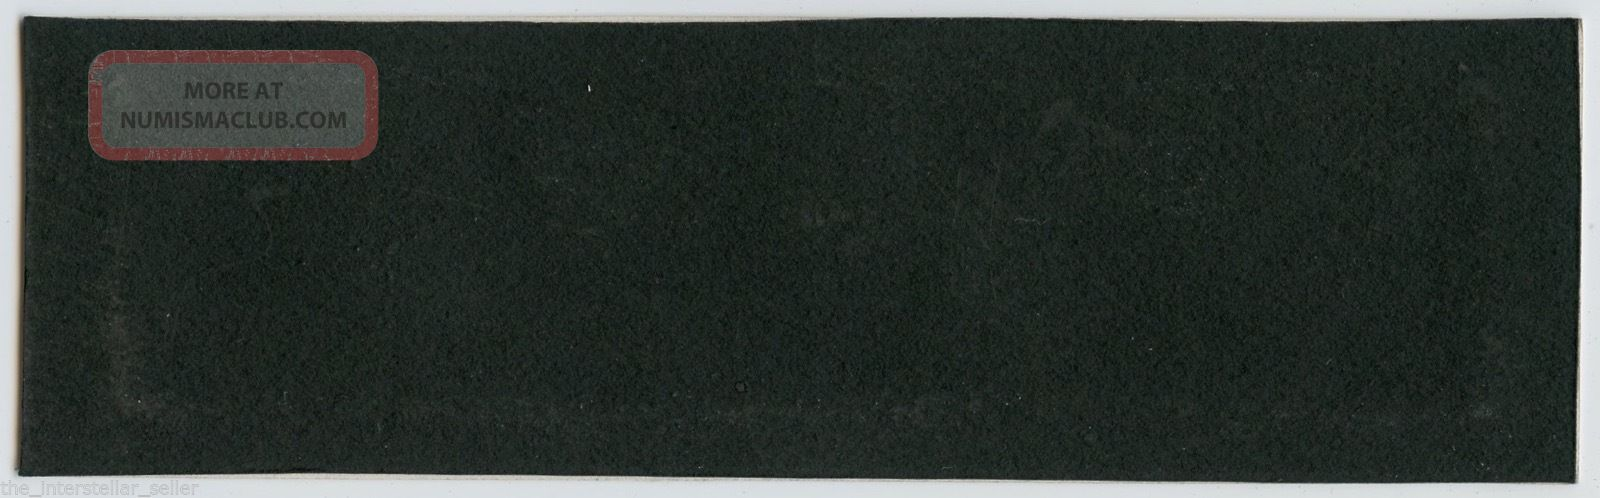 Antique Kidder,  Peabody & Co.  - Die Proof Engraving For Stock Certificate? Stocks & Bonds, Scripophily photo